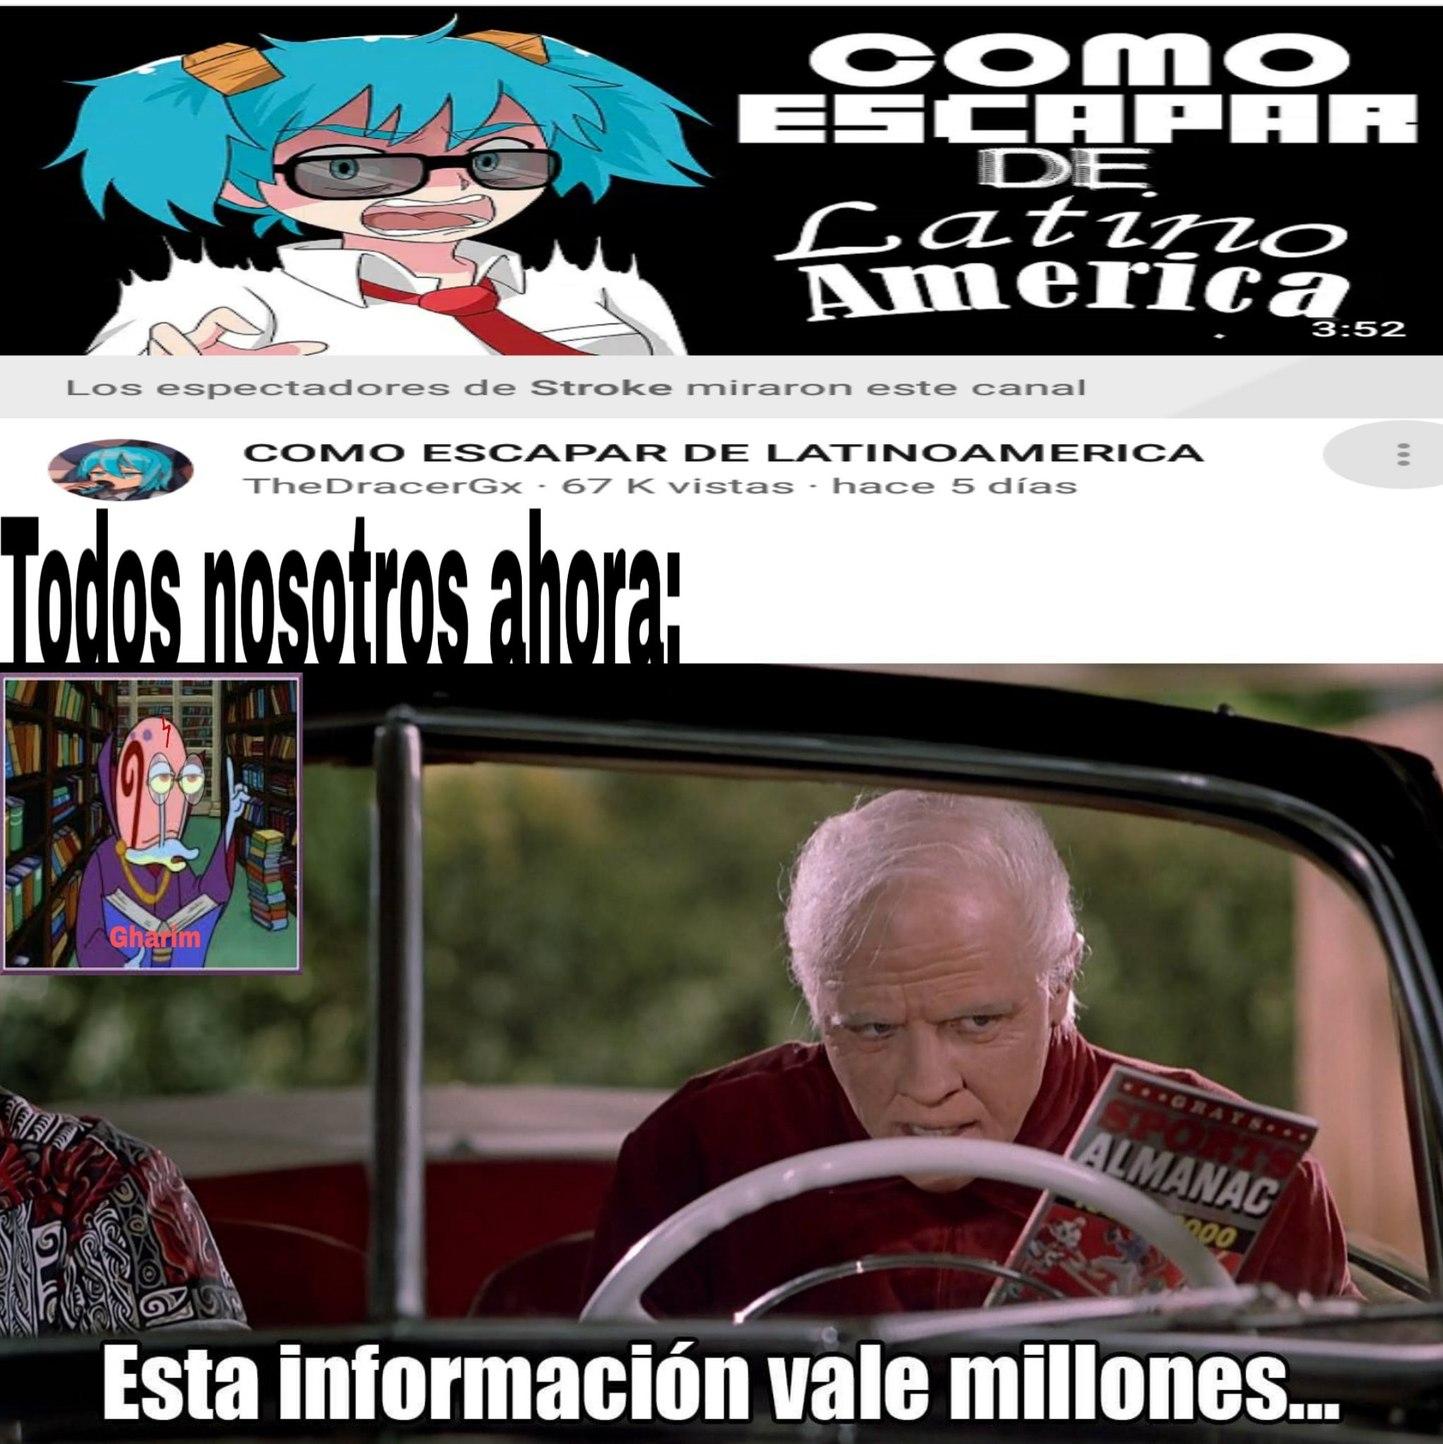 Obviamente los de Latinoamérica - meme